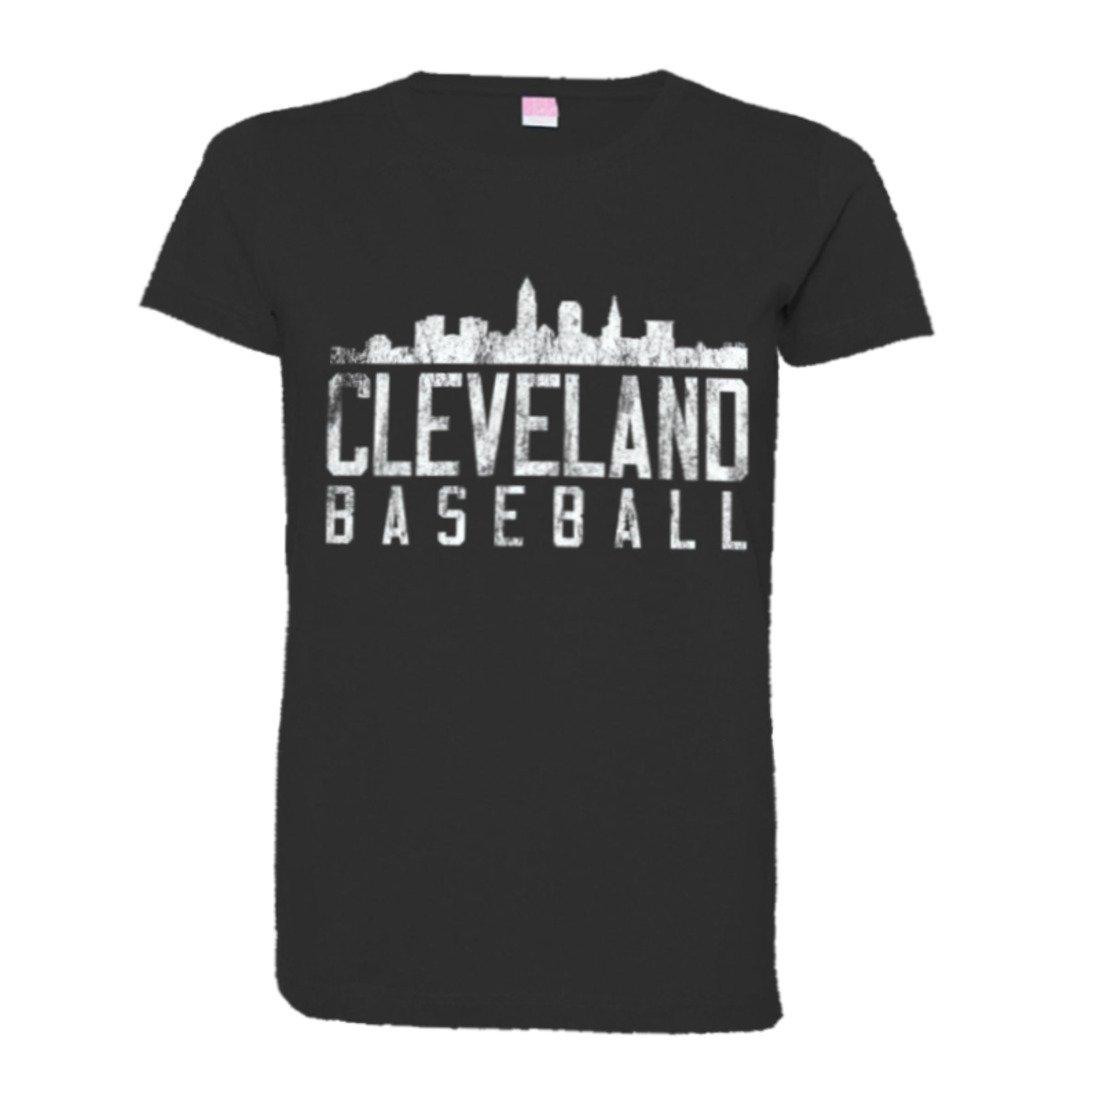 Cleveland Baseball Distressed Indians Skyline Hq Teeblks Shirts